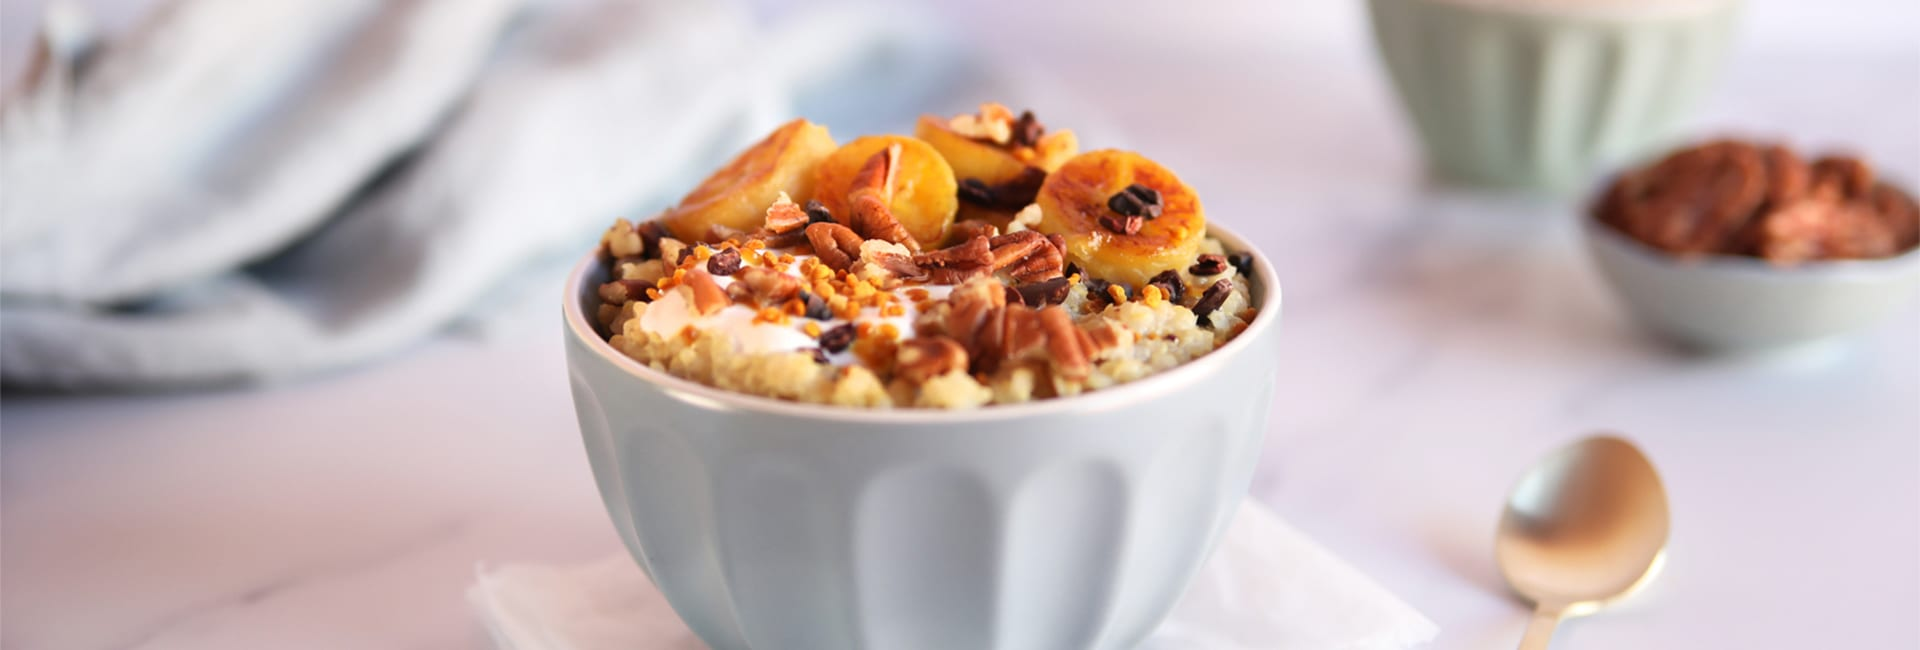 Porridge de quinoa con plátano asado